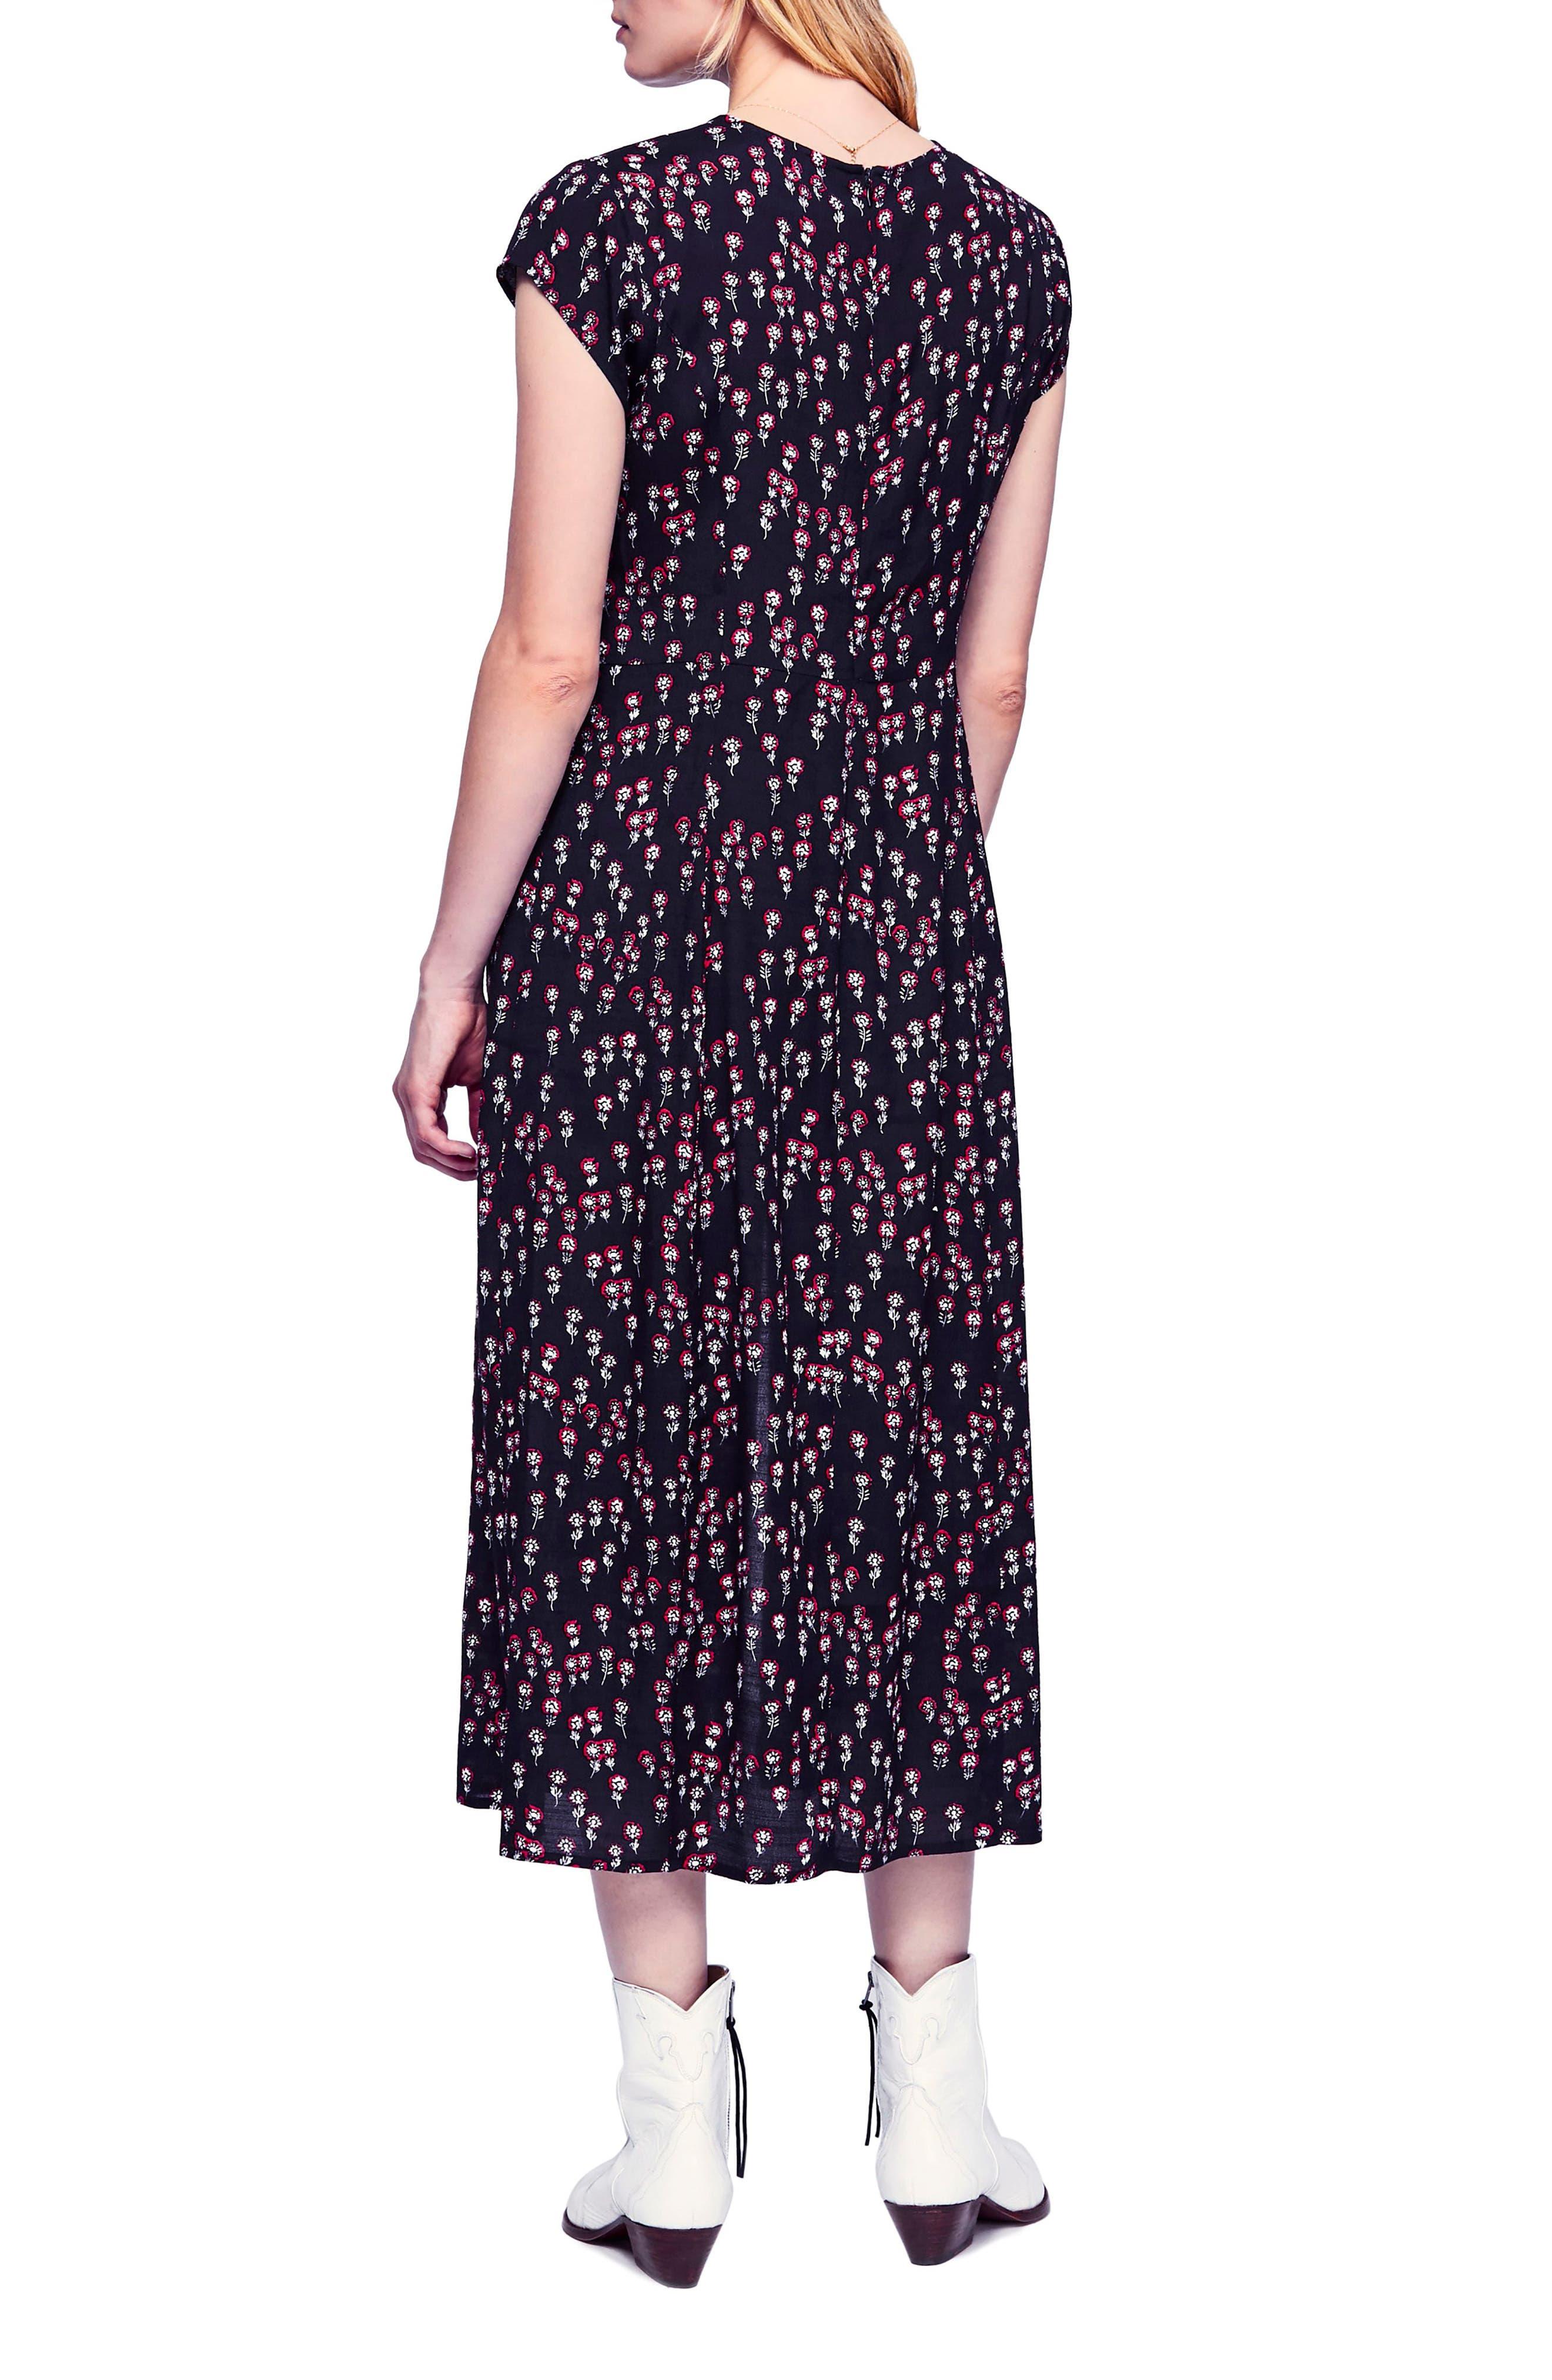 FREE PEOPLE,                             Corrie Midi Dress,                             Alternate thumbnail 2, color,                             BLACK